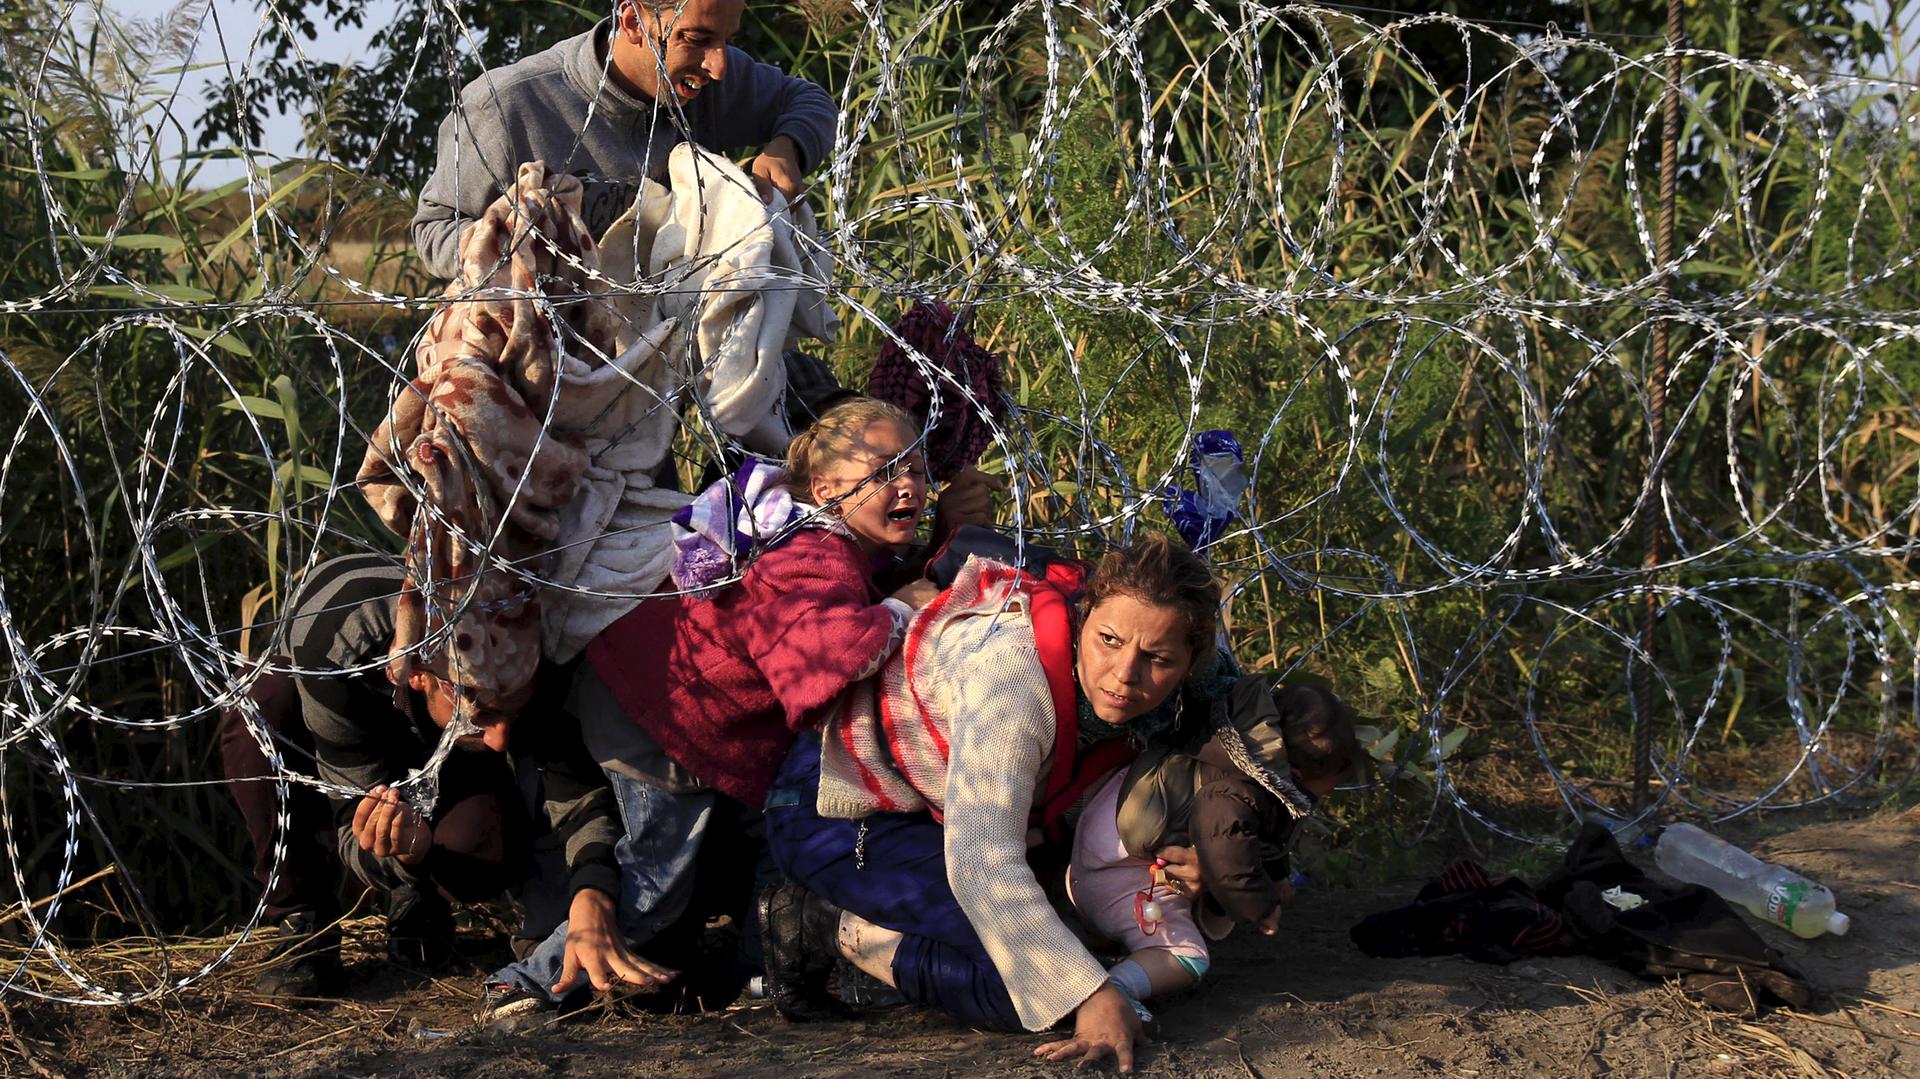 Восток против Запада: как мигранты разделили Европу